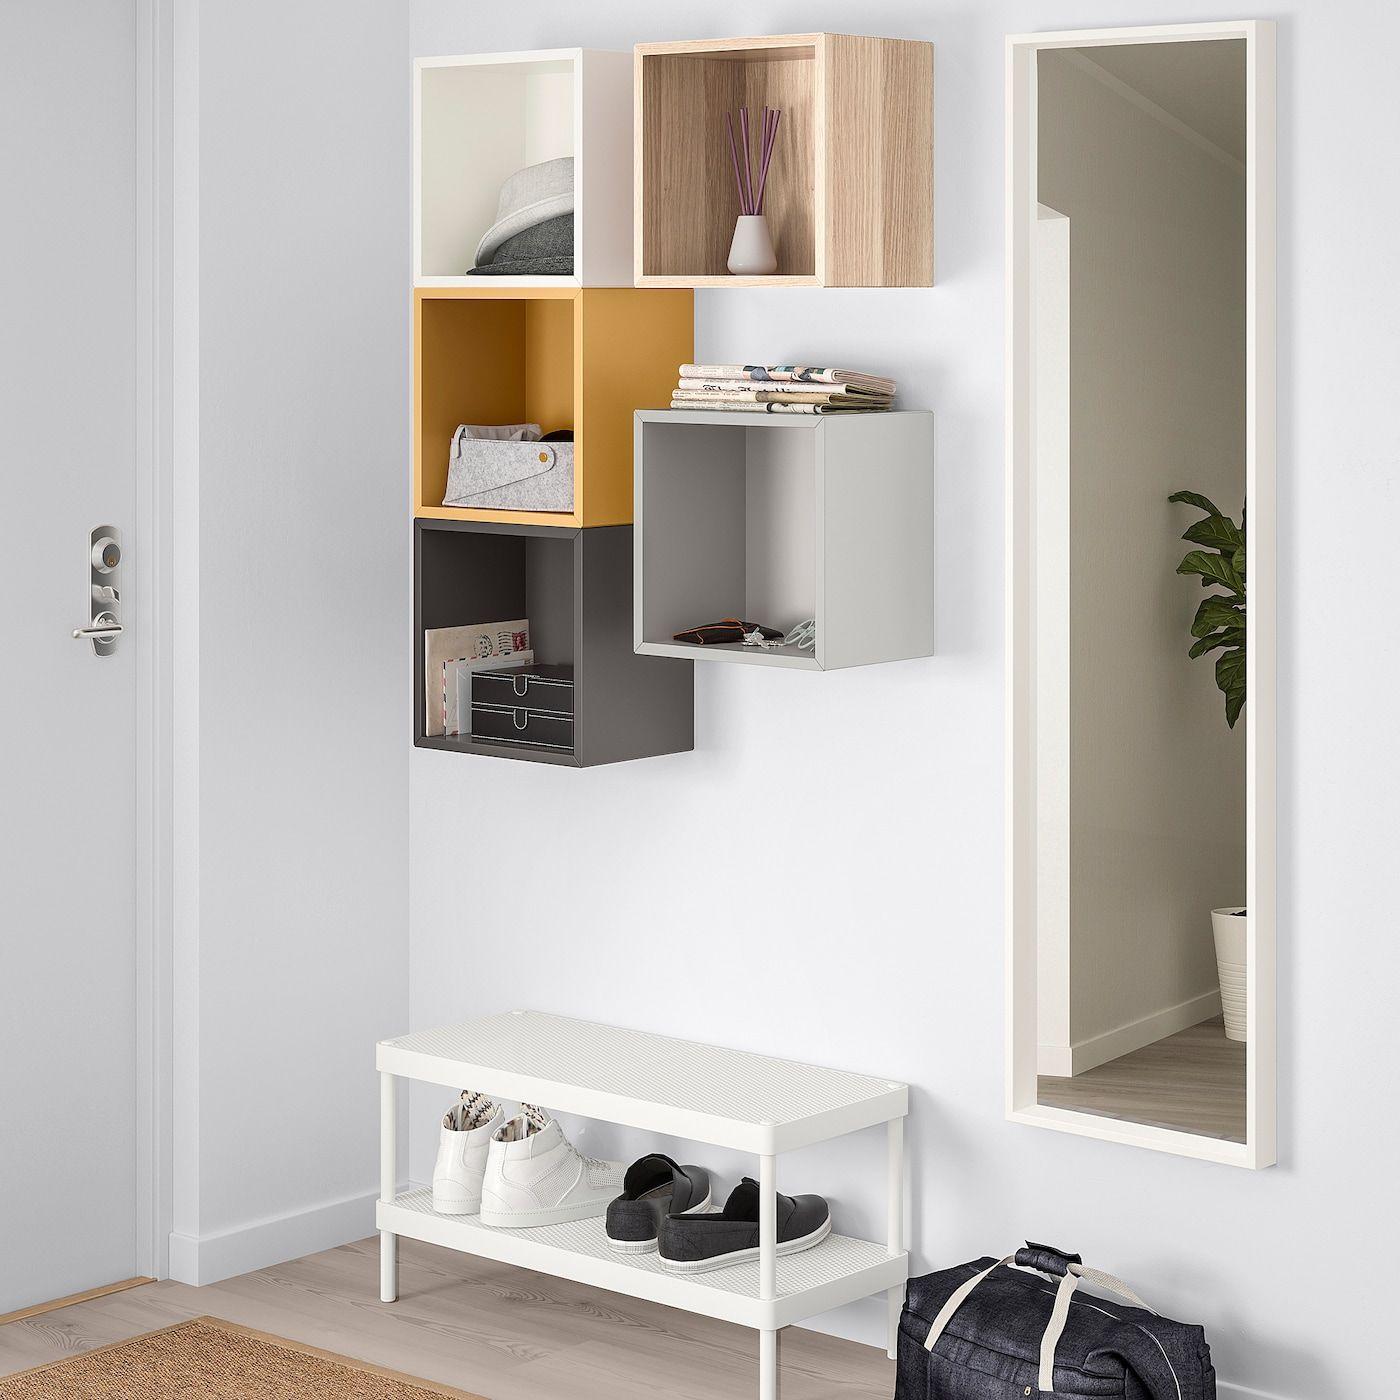 Libreria Da Parete Ikea ikea eket multicolor 1 wall-mounted storage combination in